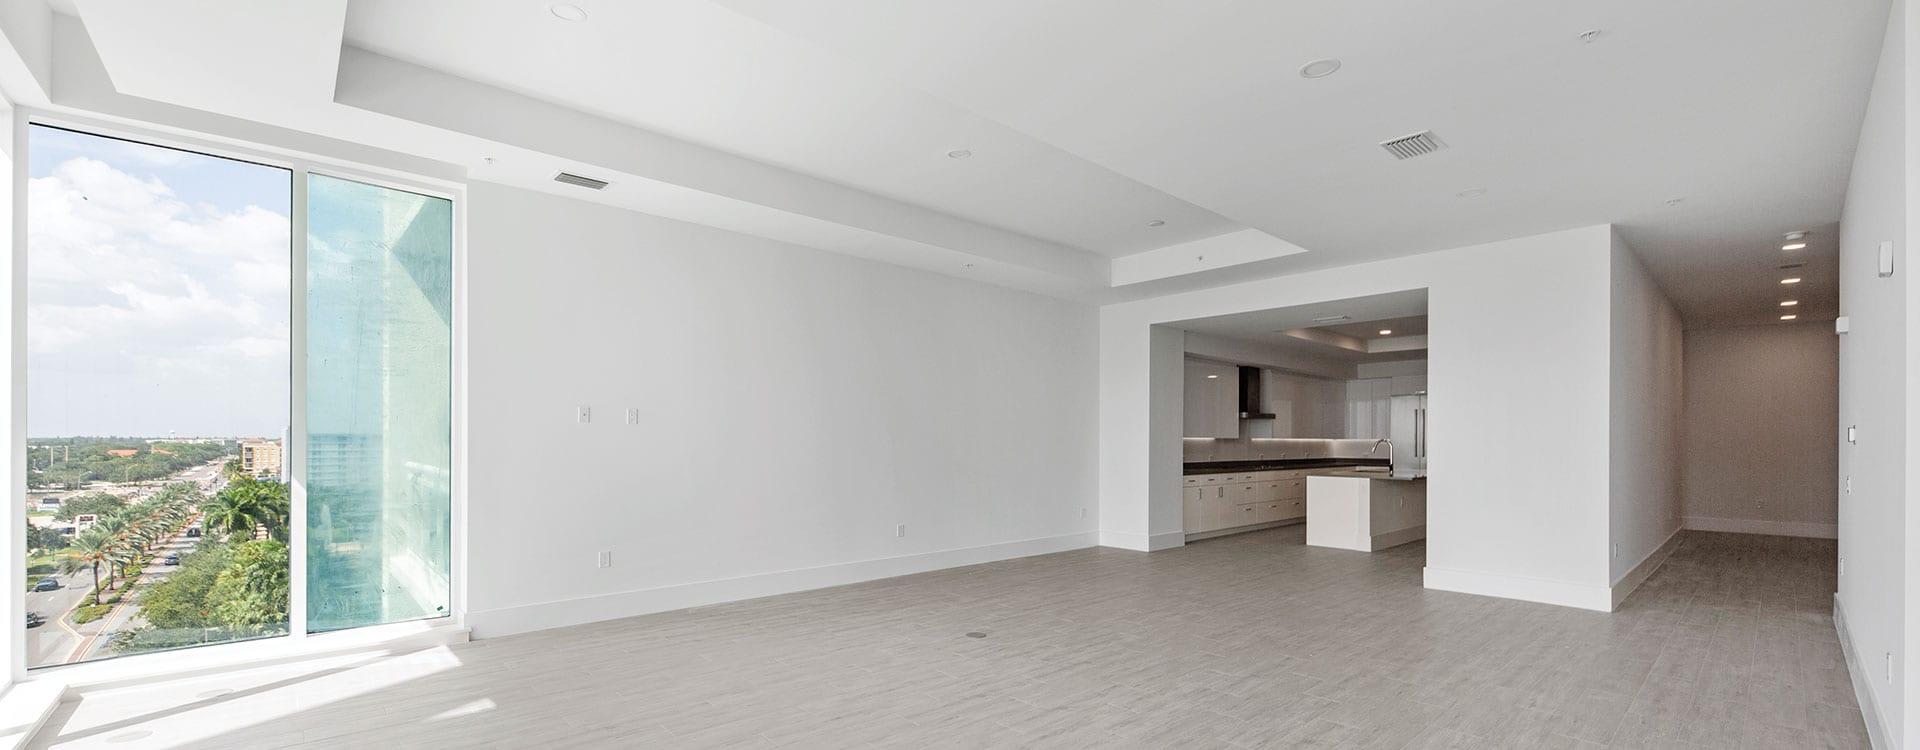 BLVD Sarasota Residence 803 Great Room